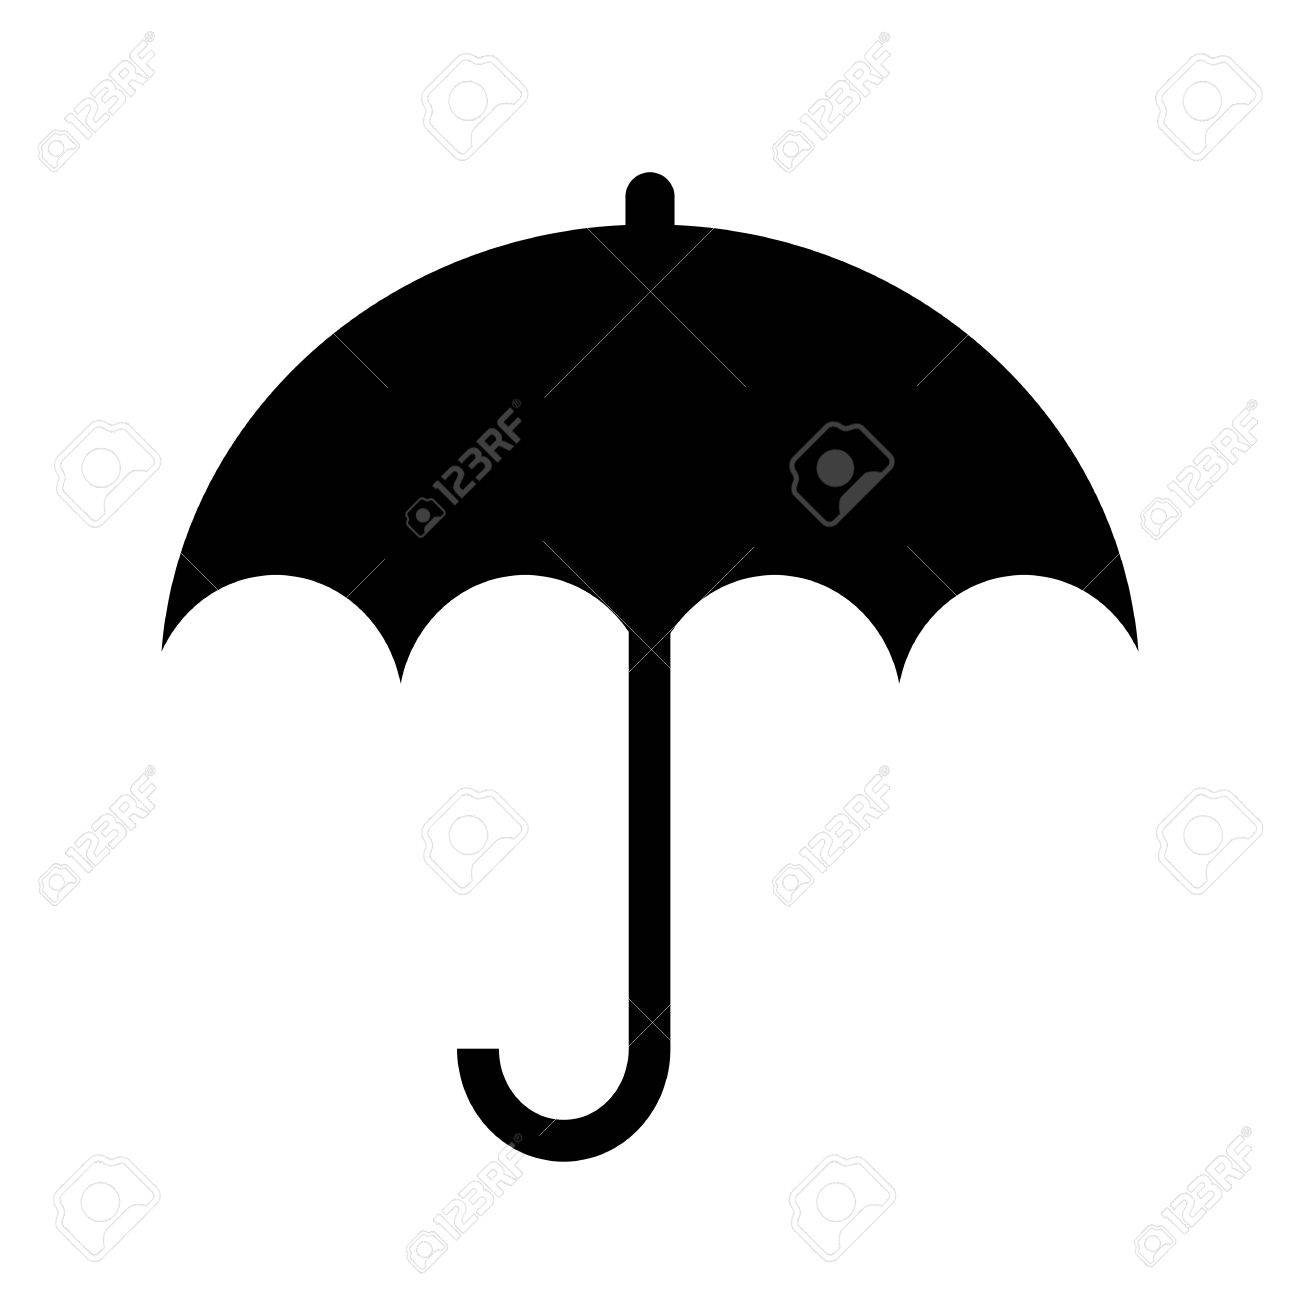 5e51d11334d0a Umbrella Silhouette Icon Royalty Free Cliparts, Vectors, And Stock ...